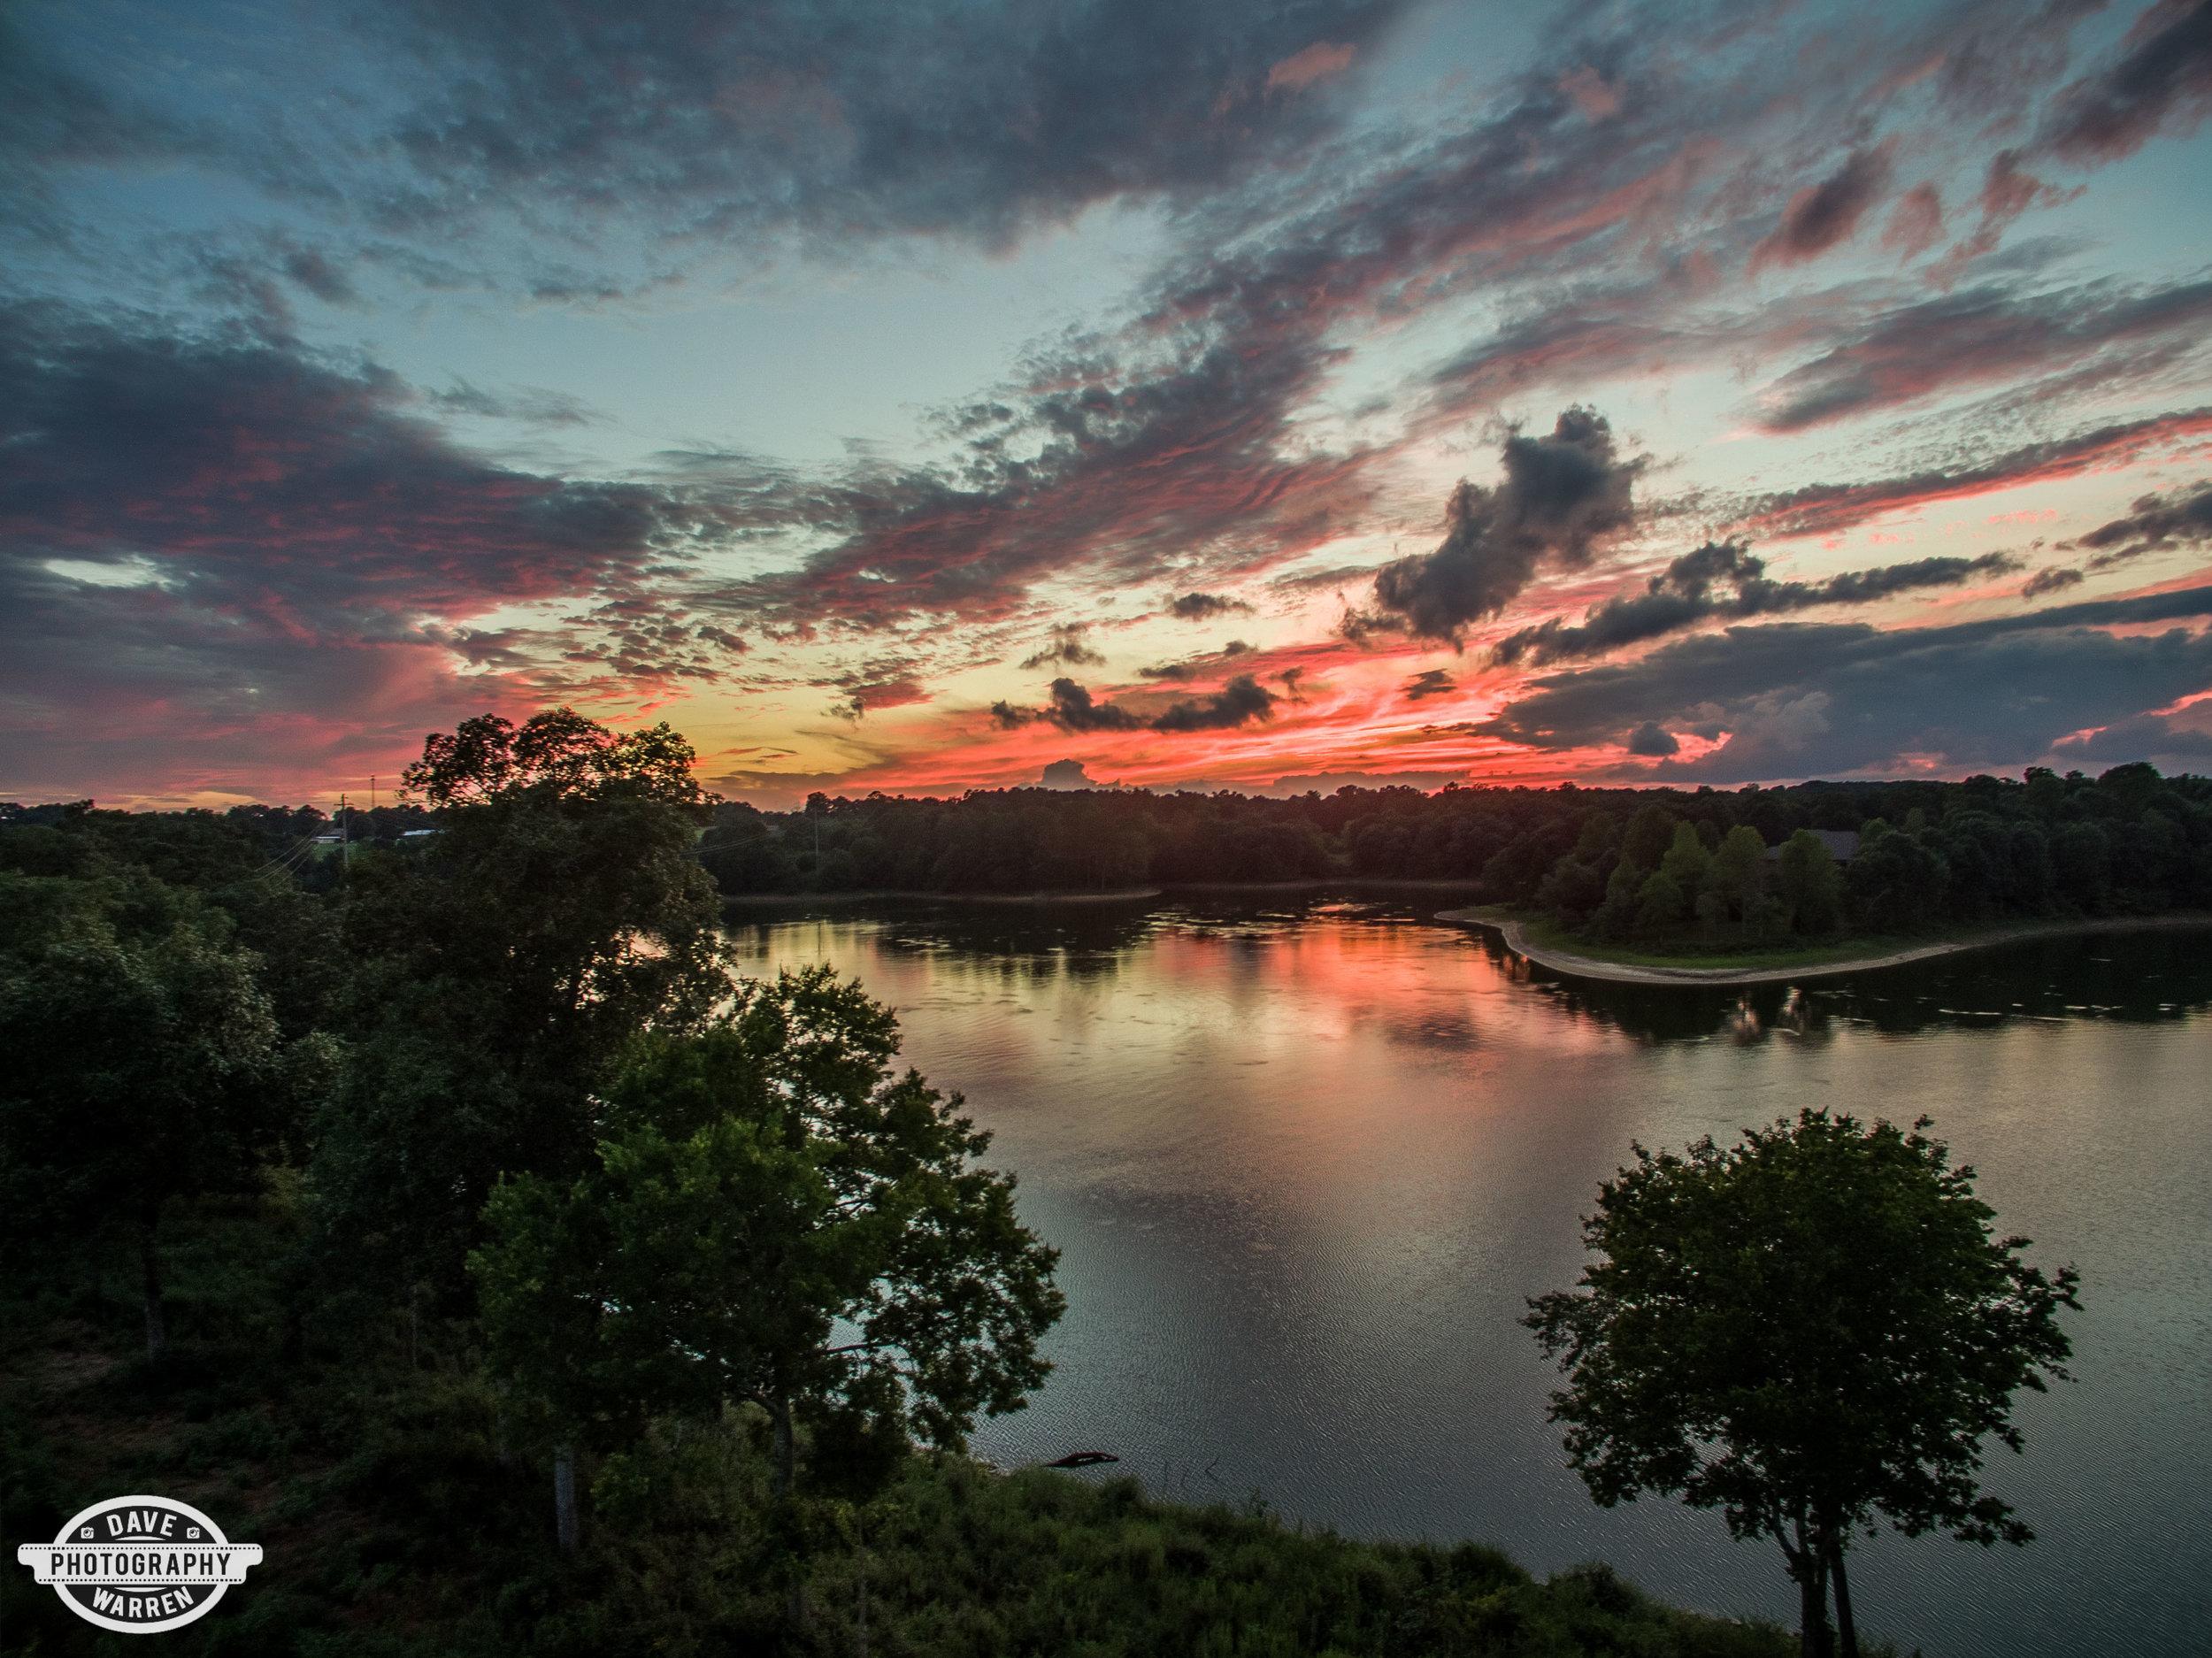 Sunset over Lake Catoma